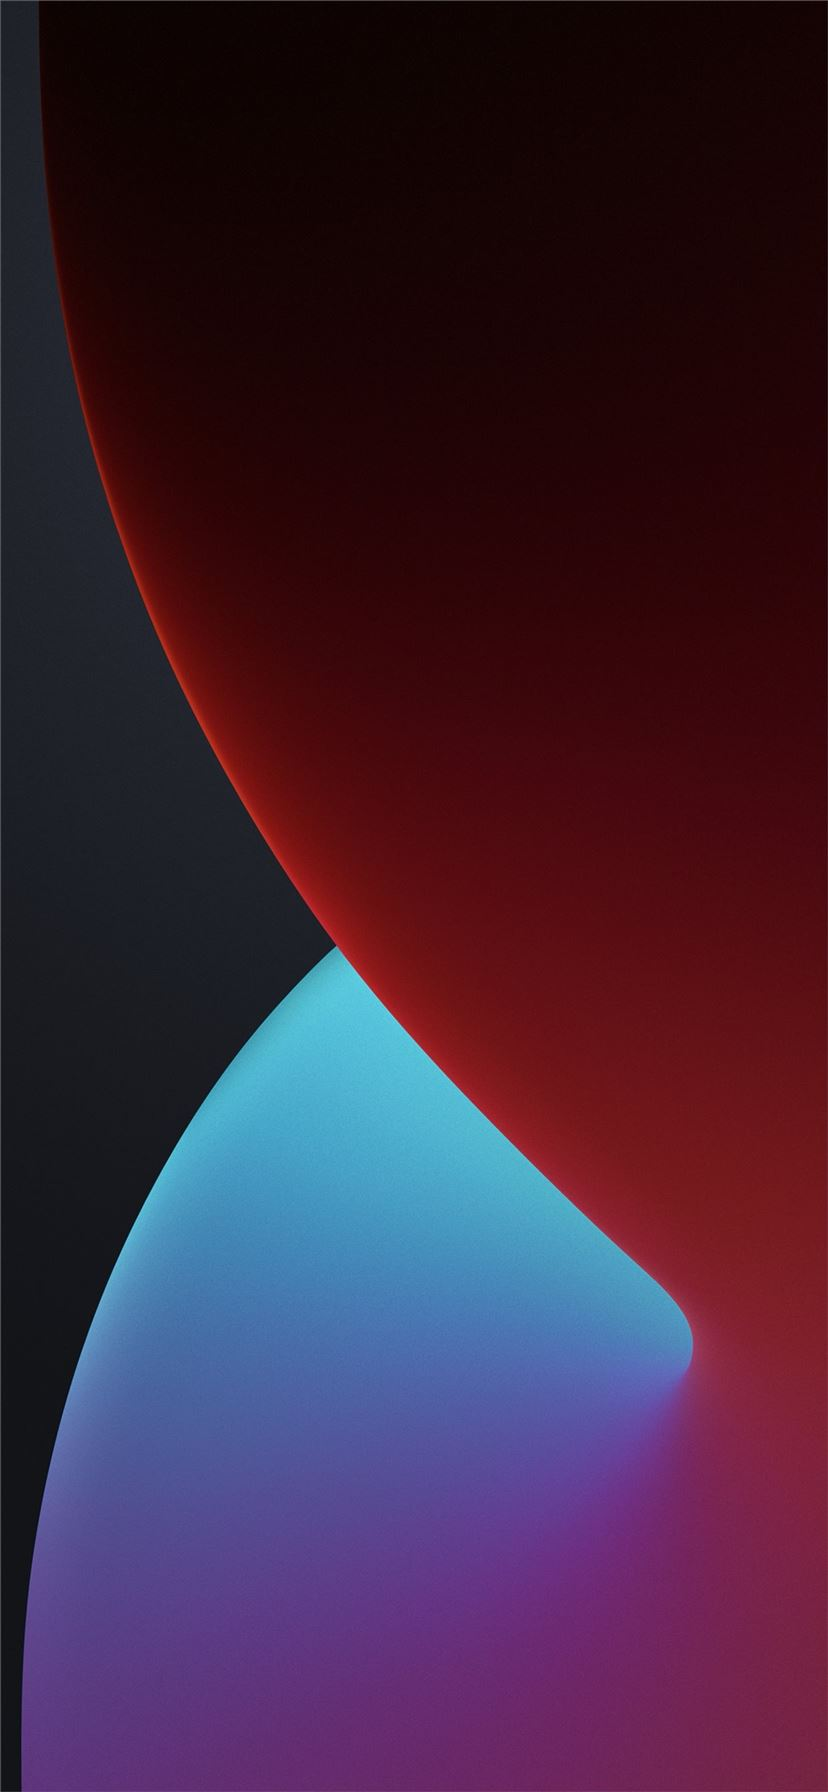 Ios 14 Stock Wallpaper Warm Dark Iphone 11 Wallpapers Free Download